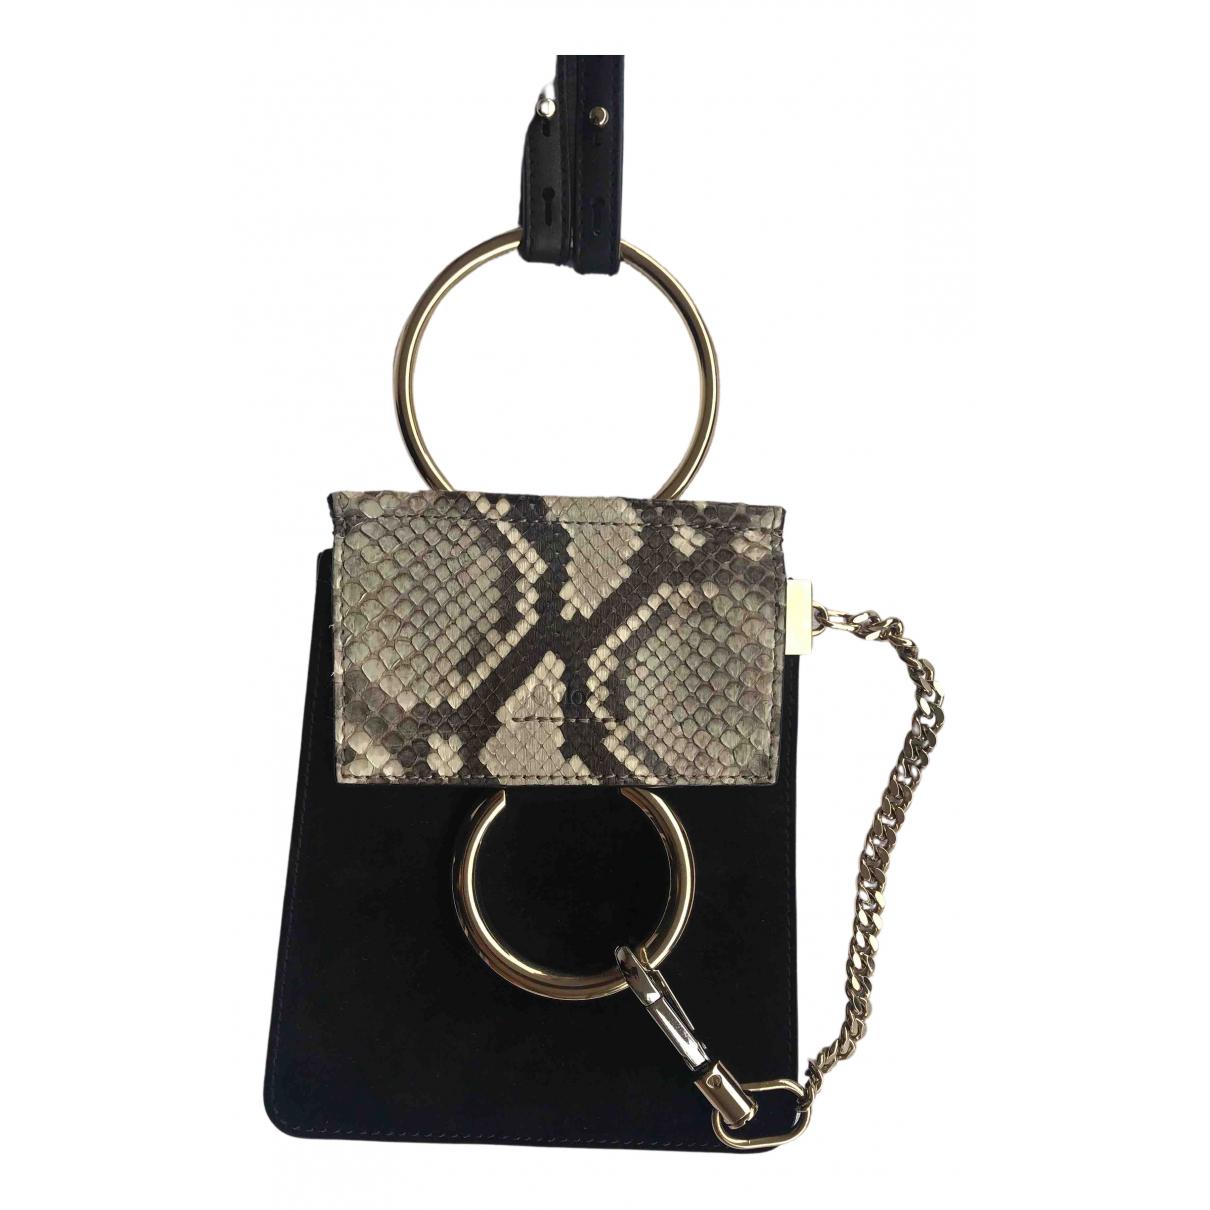 Chloé Faye Black Python handbag for Women N